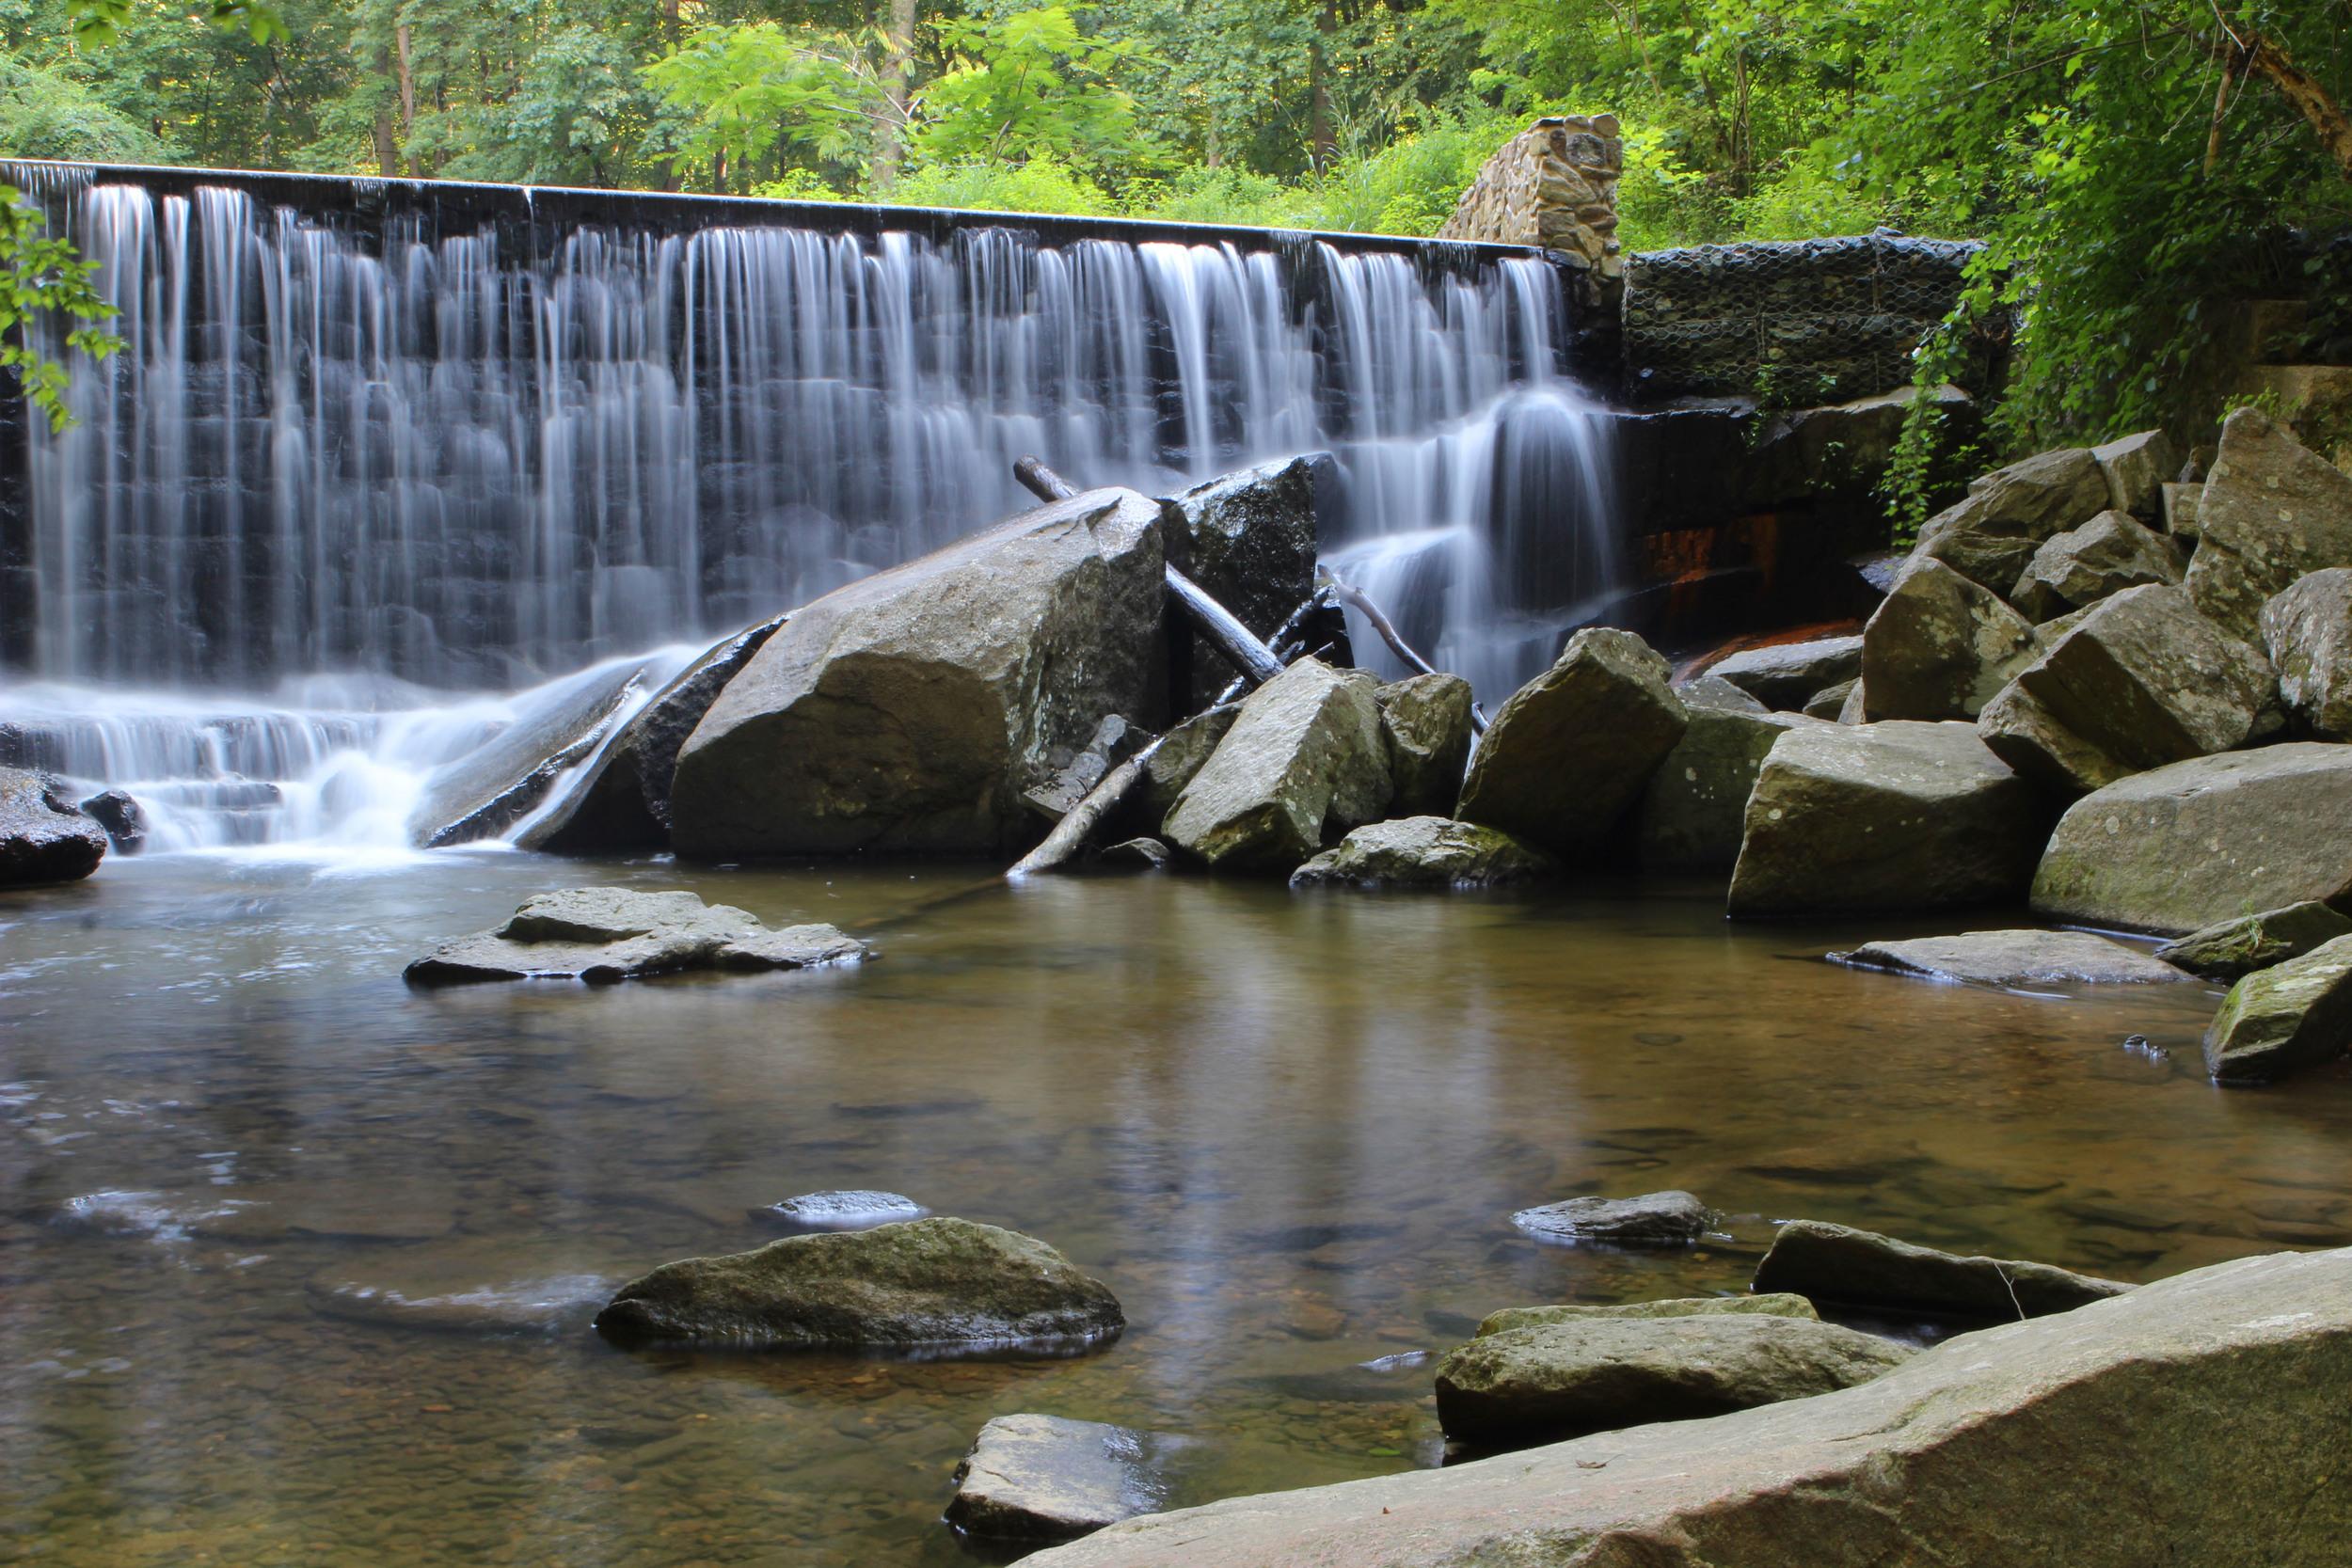 Waterfall | Susquehanna State Park, MD - Jess Rudolph Photography: www.jessrudolph.com